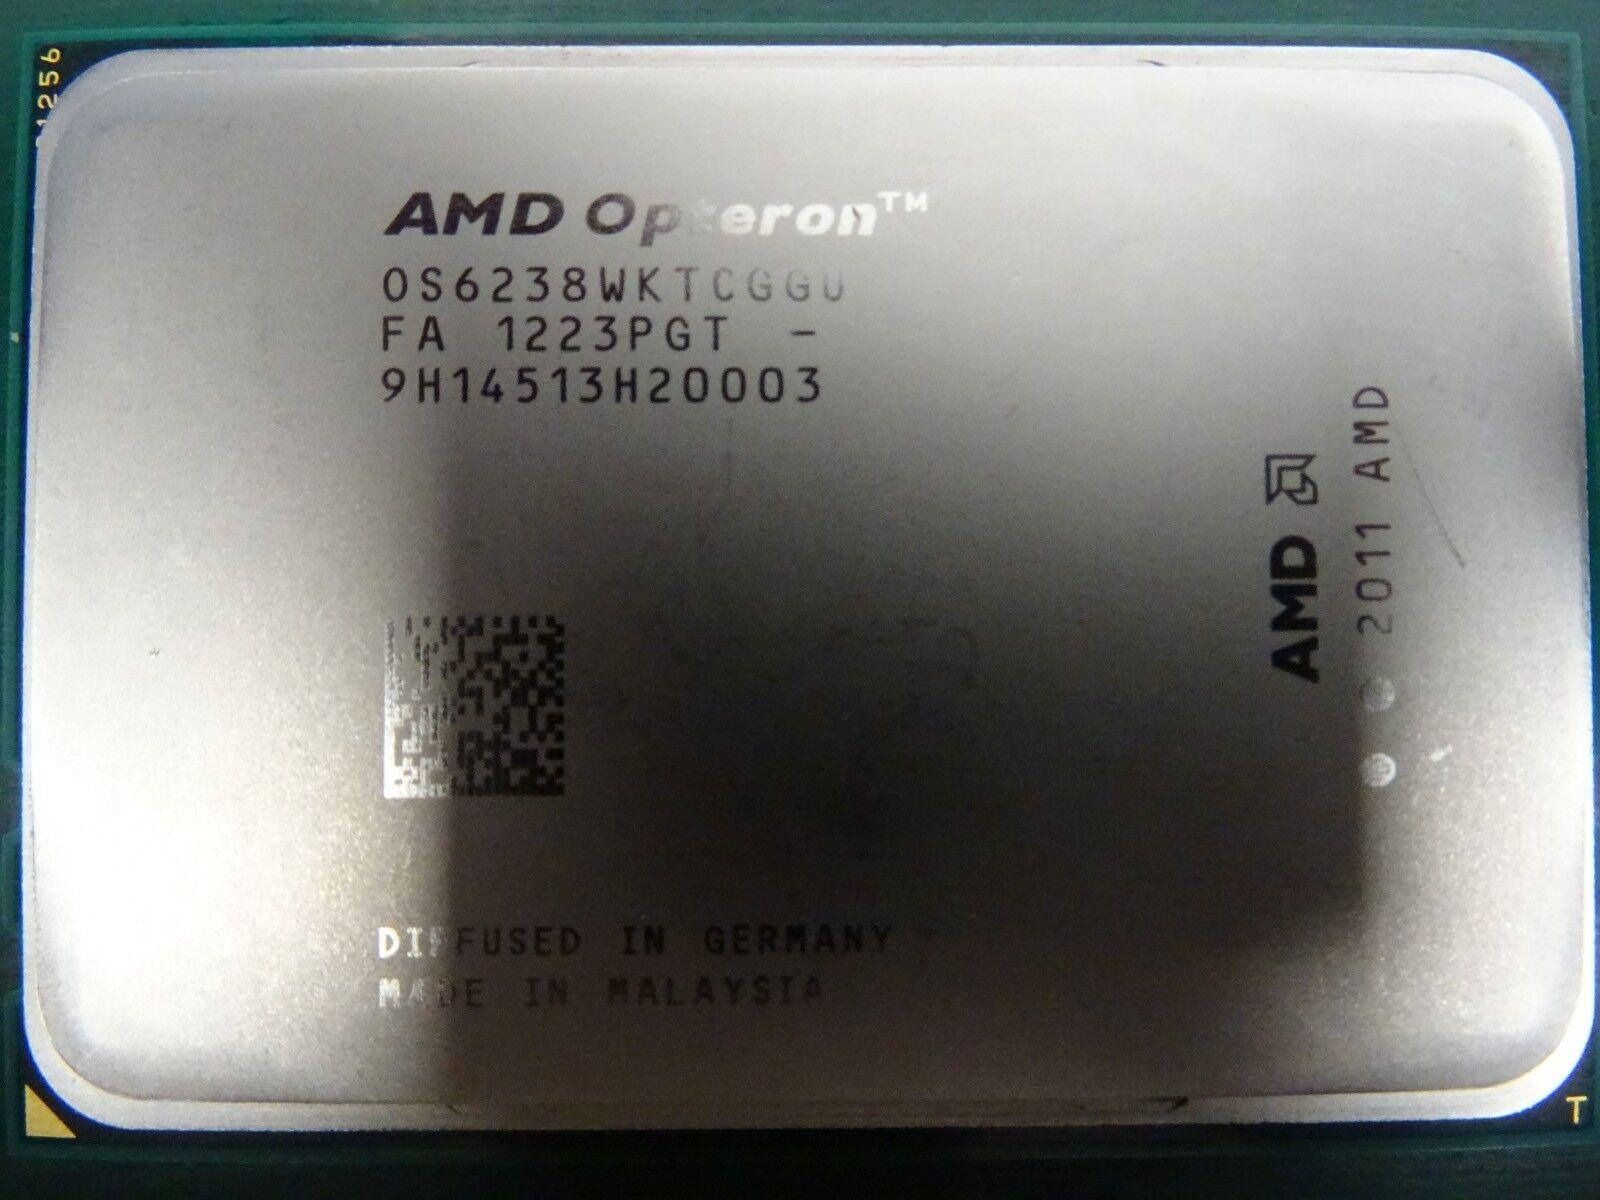 AMD Opteron 6238 2.6GHz 12 Core OS6238WKTCGGU Processor